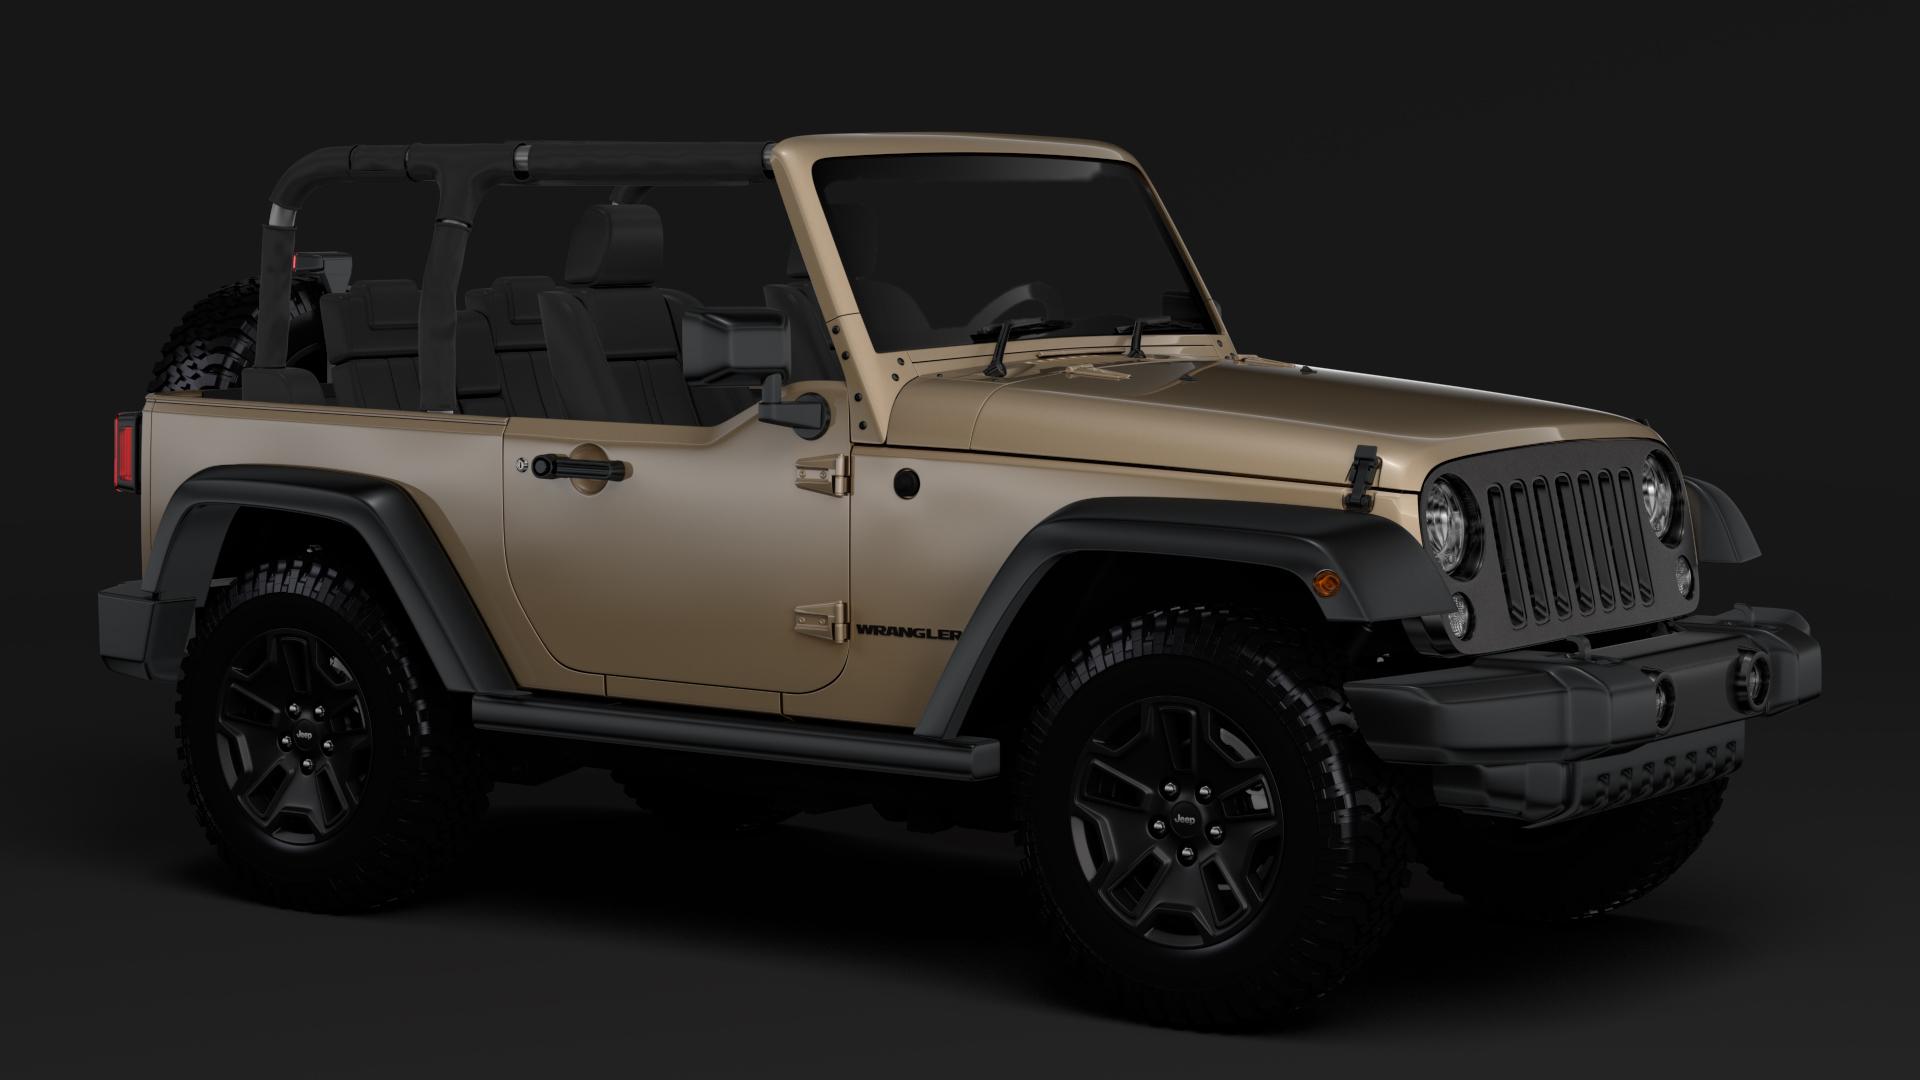 jeep wrangler willys wheeler jk 2017 3d model max fbx c4d lwo ma mb hrc xsi obj 276797